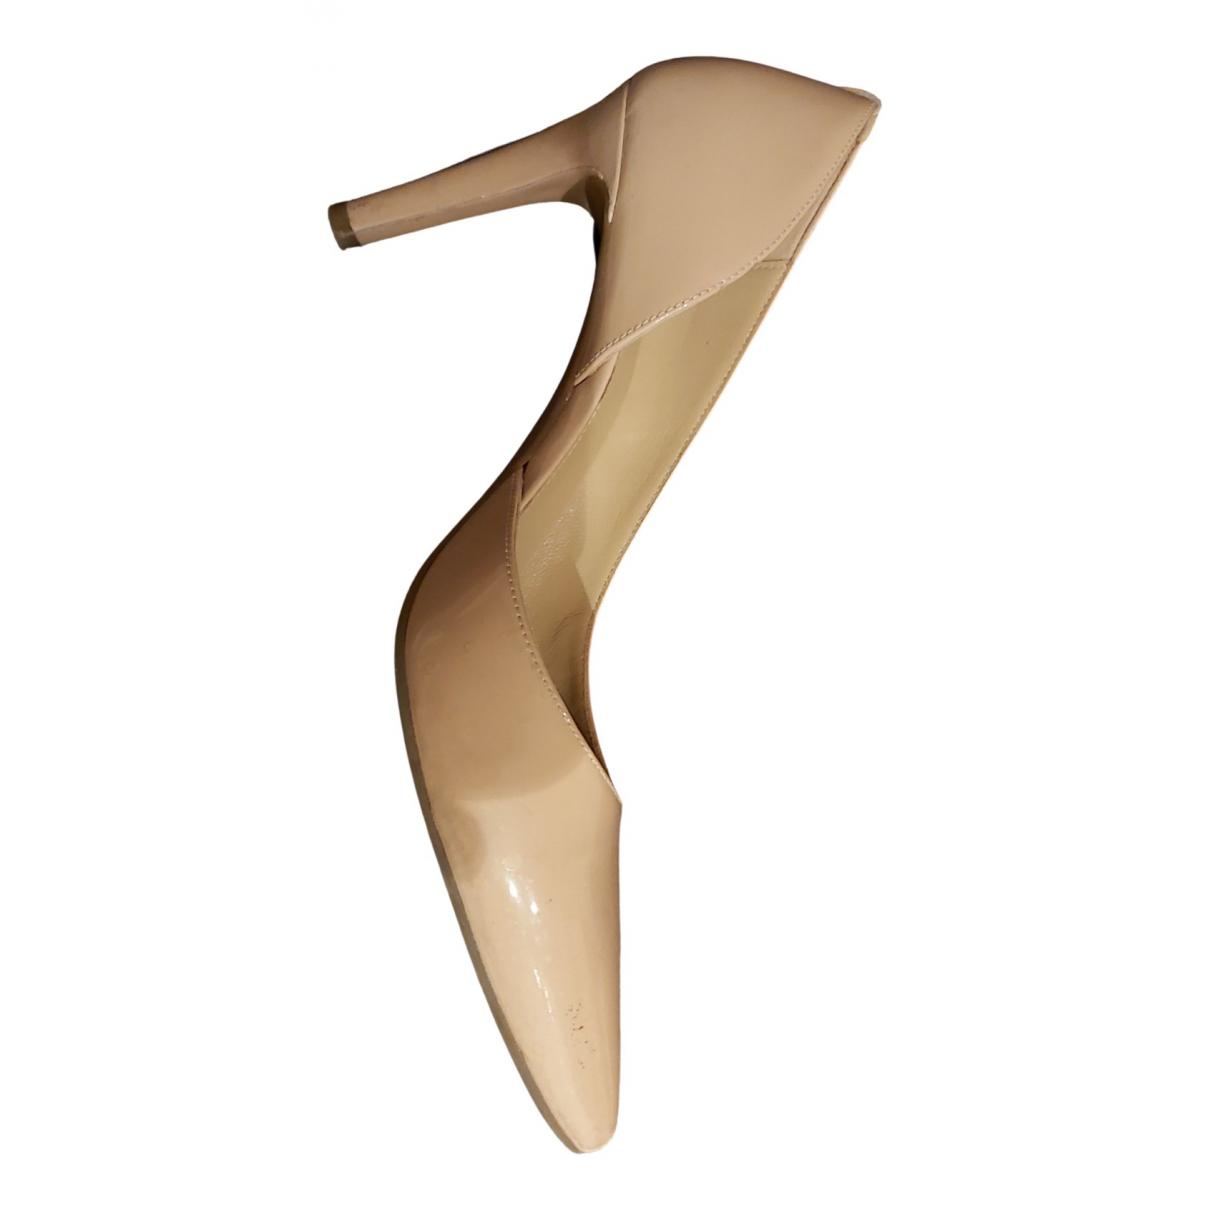 Michael Kors \N Beige Patent leather Heels for Women 39 EU